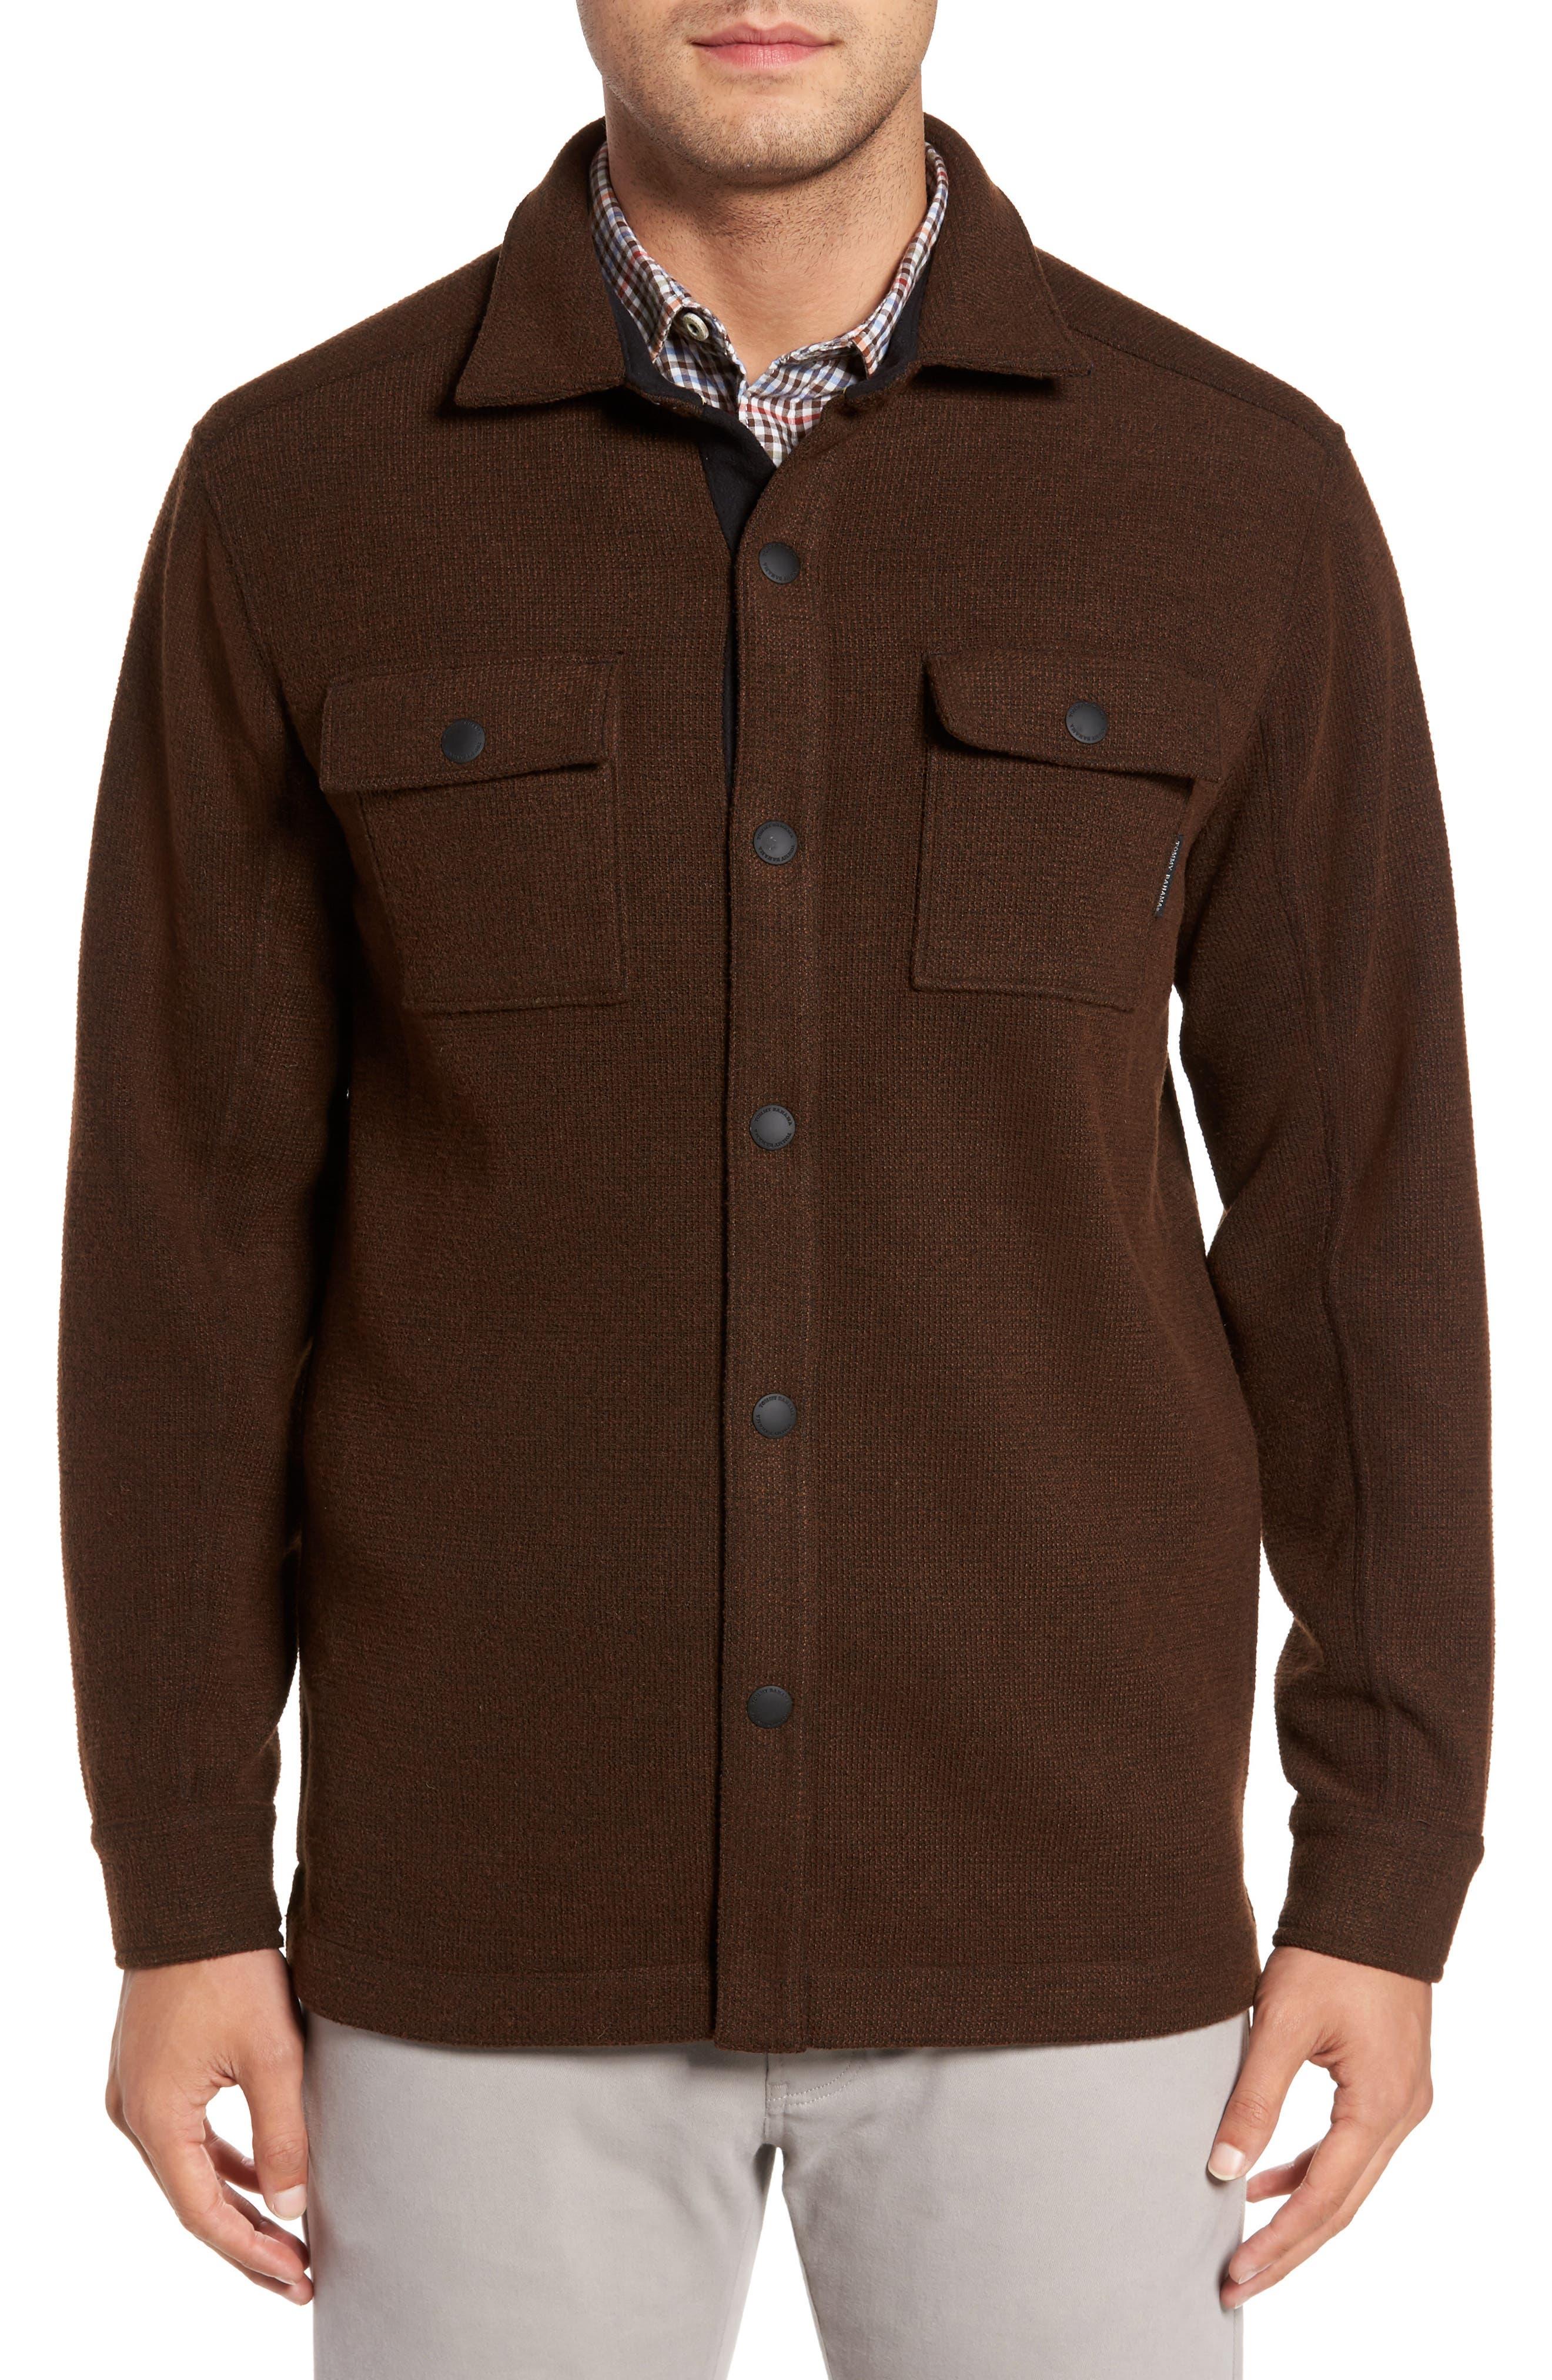 Main Image - Tommy Bahama Paradise Creek Snap Front Fleece Jacket